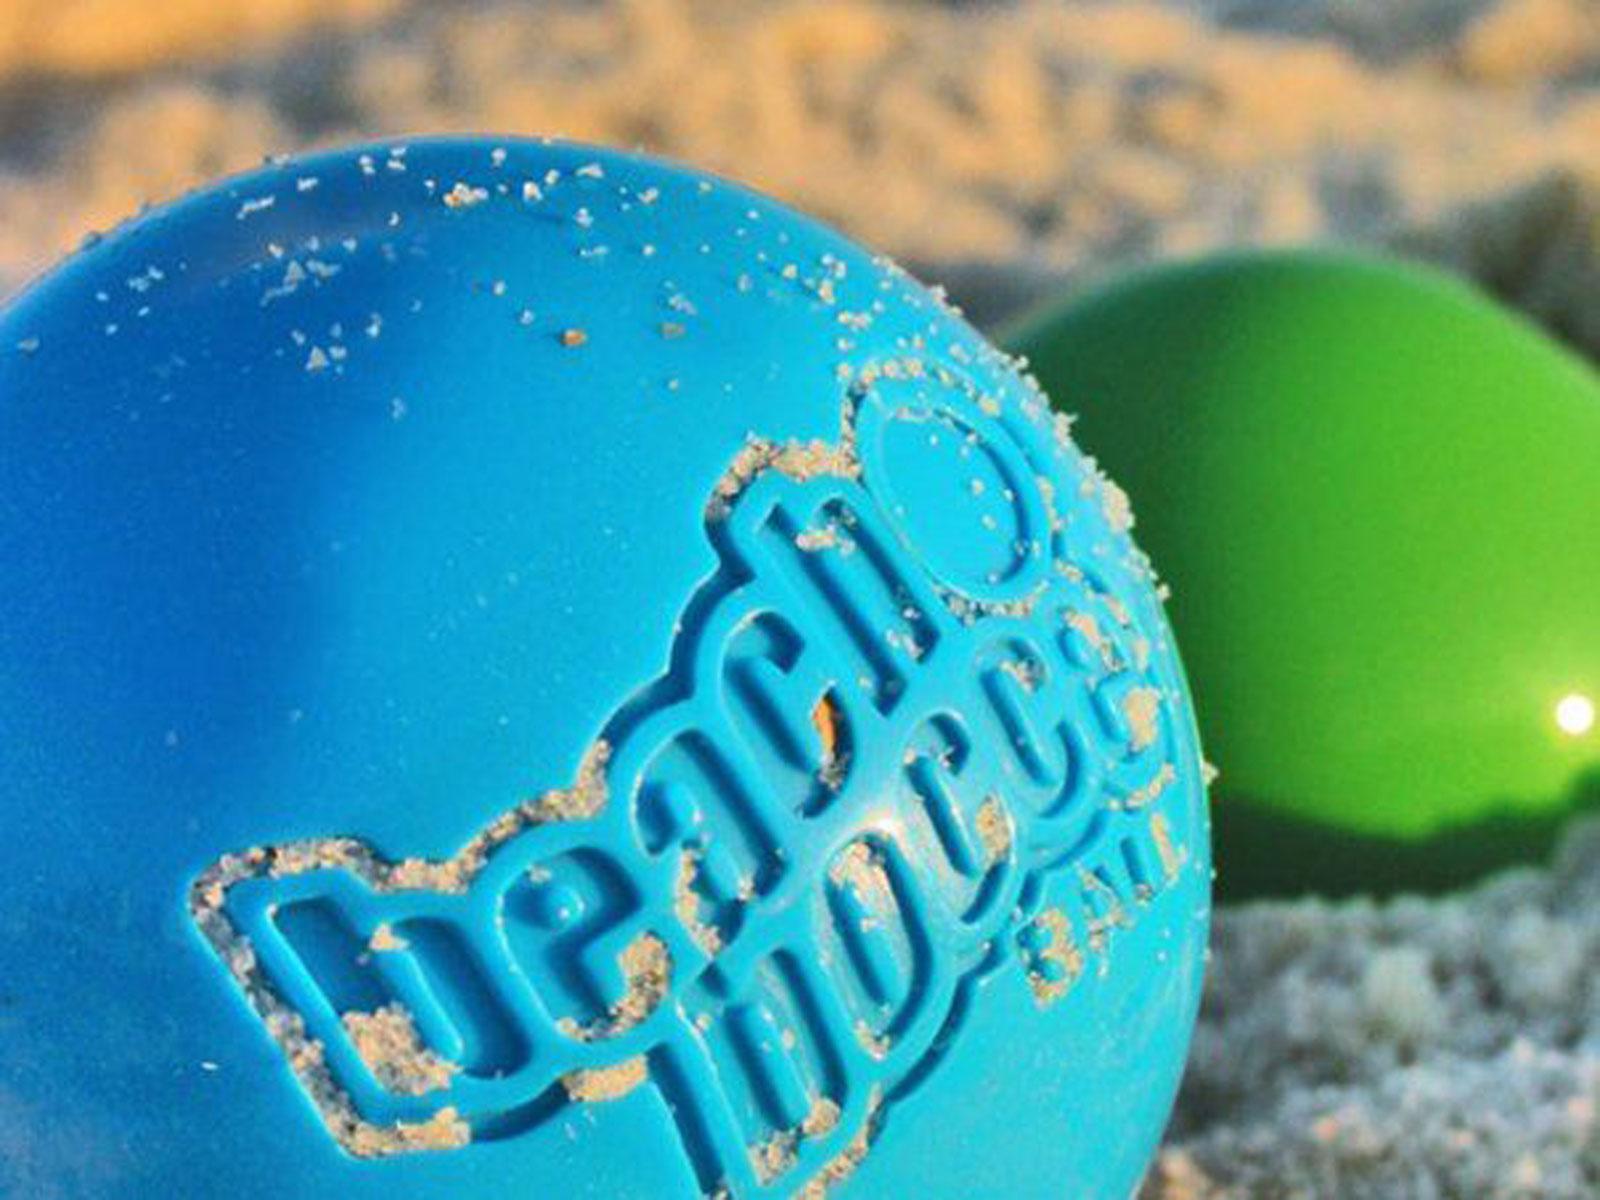 Beach Bocce Ball- Beach Games for the Whole Family